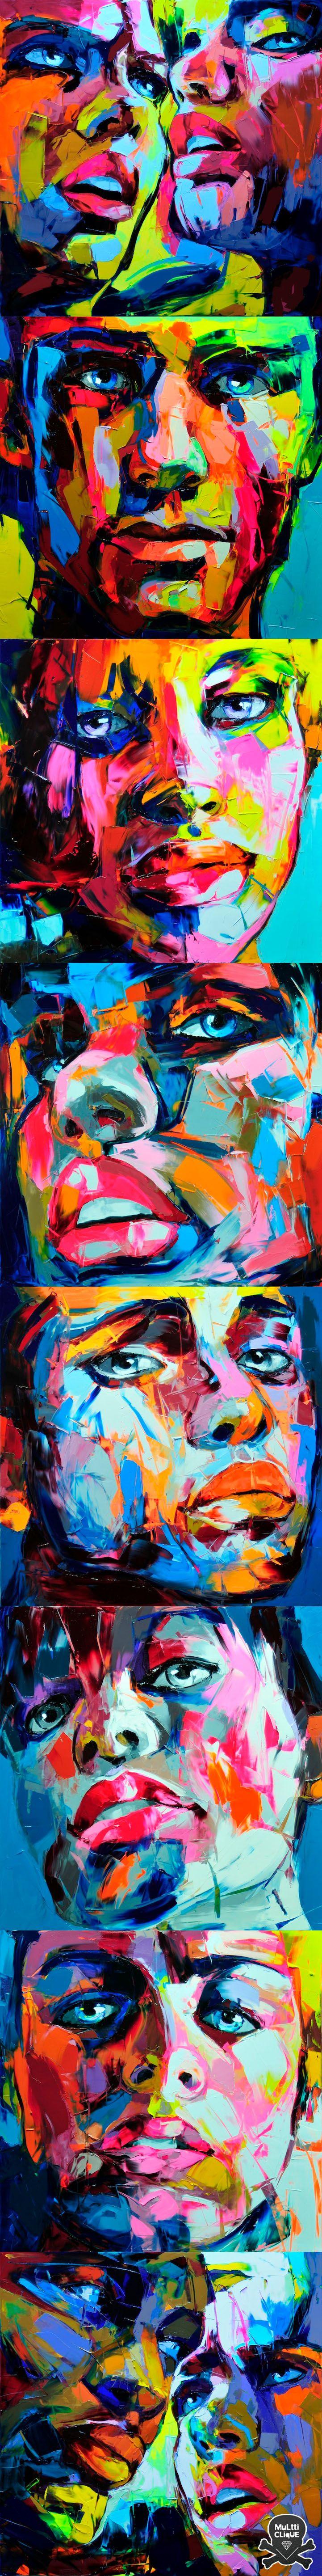 graphic color - Françoise Nielly